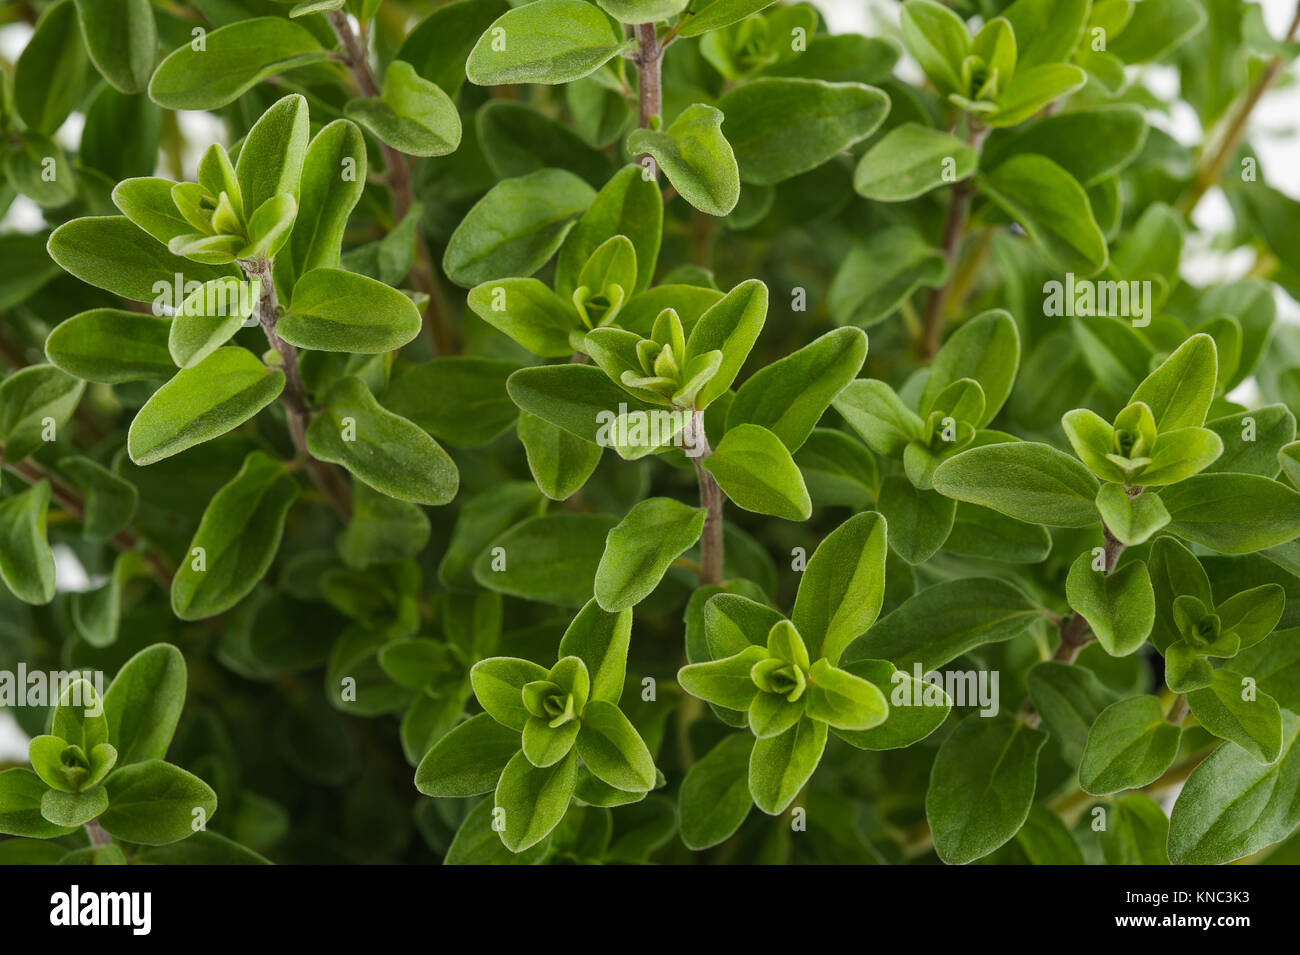 Fresh green marjoram plants background - Stock Image